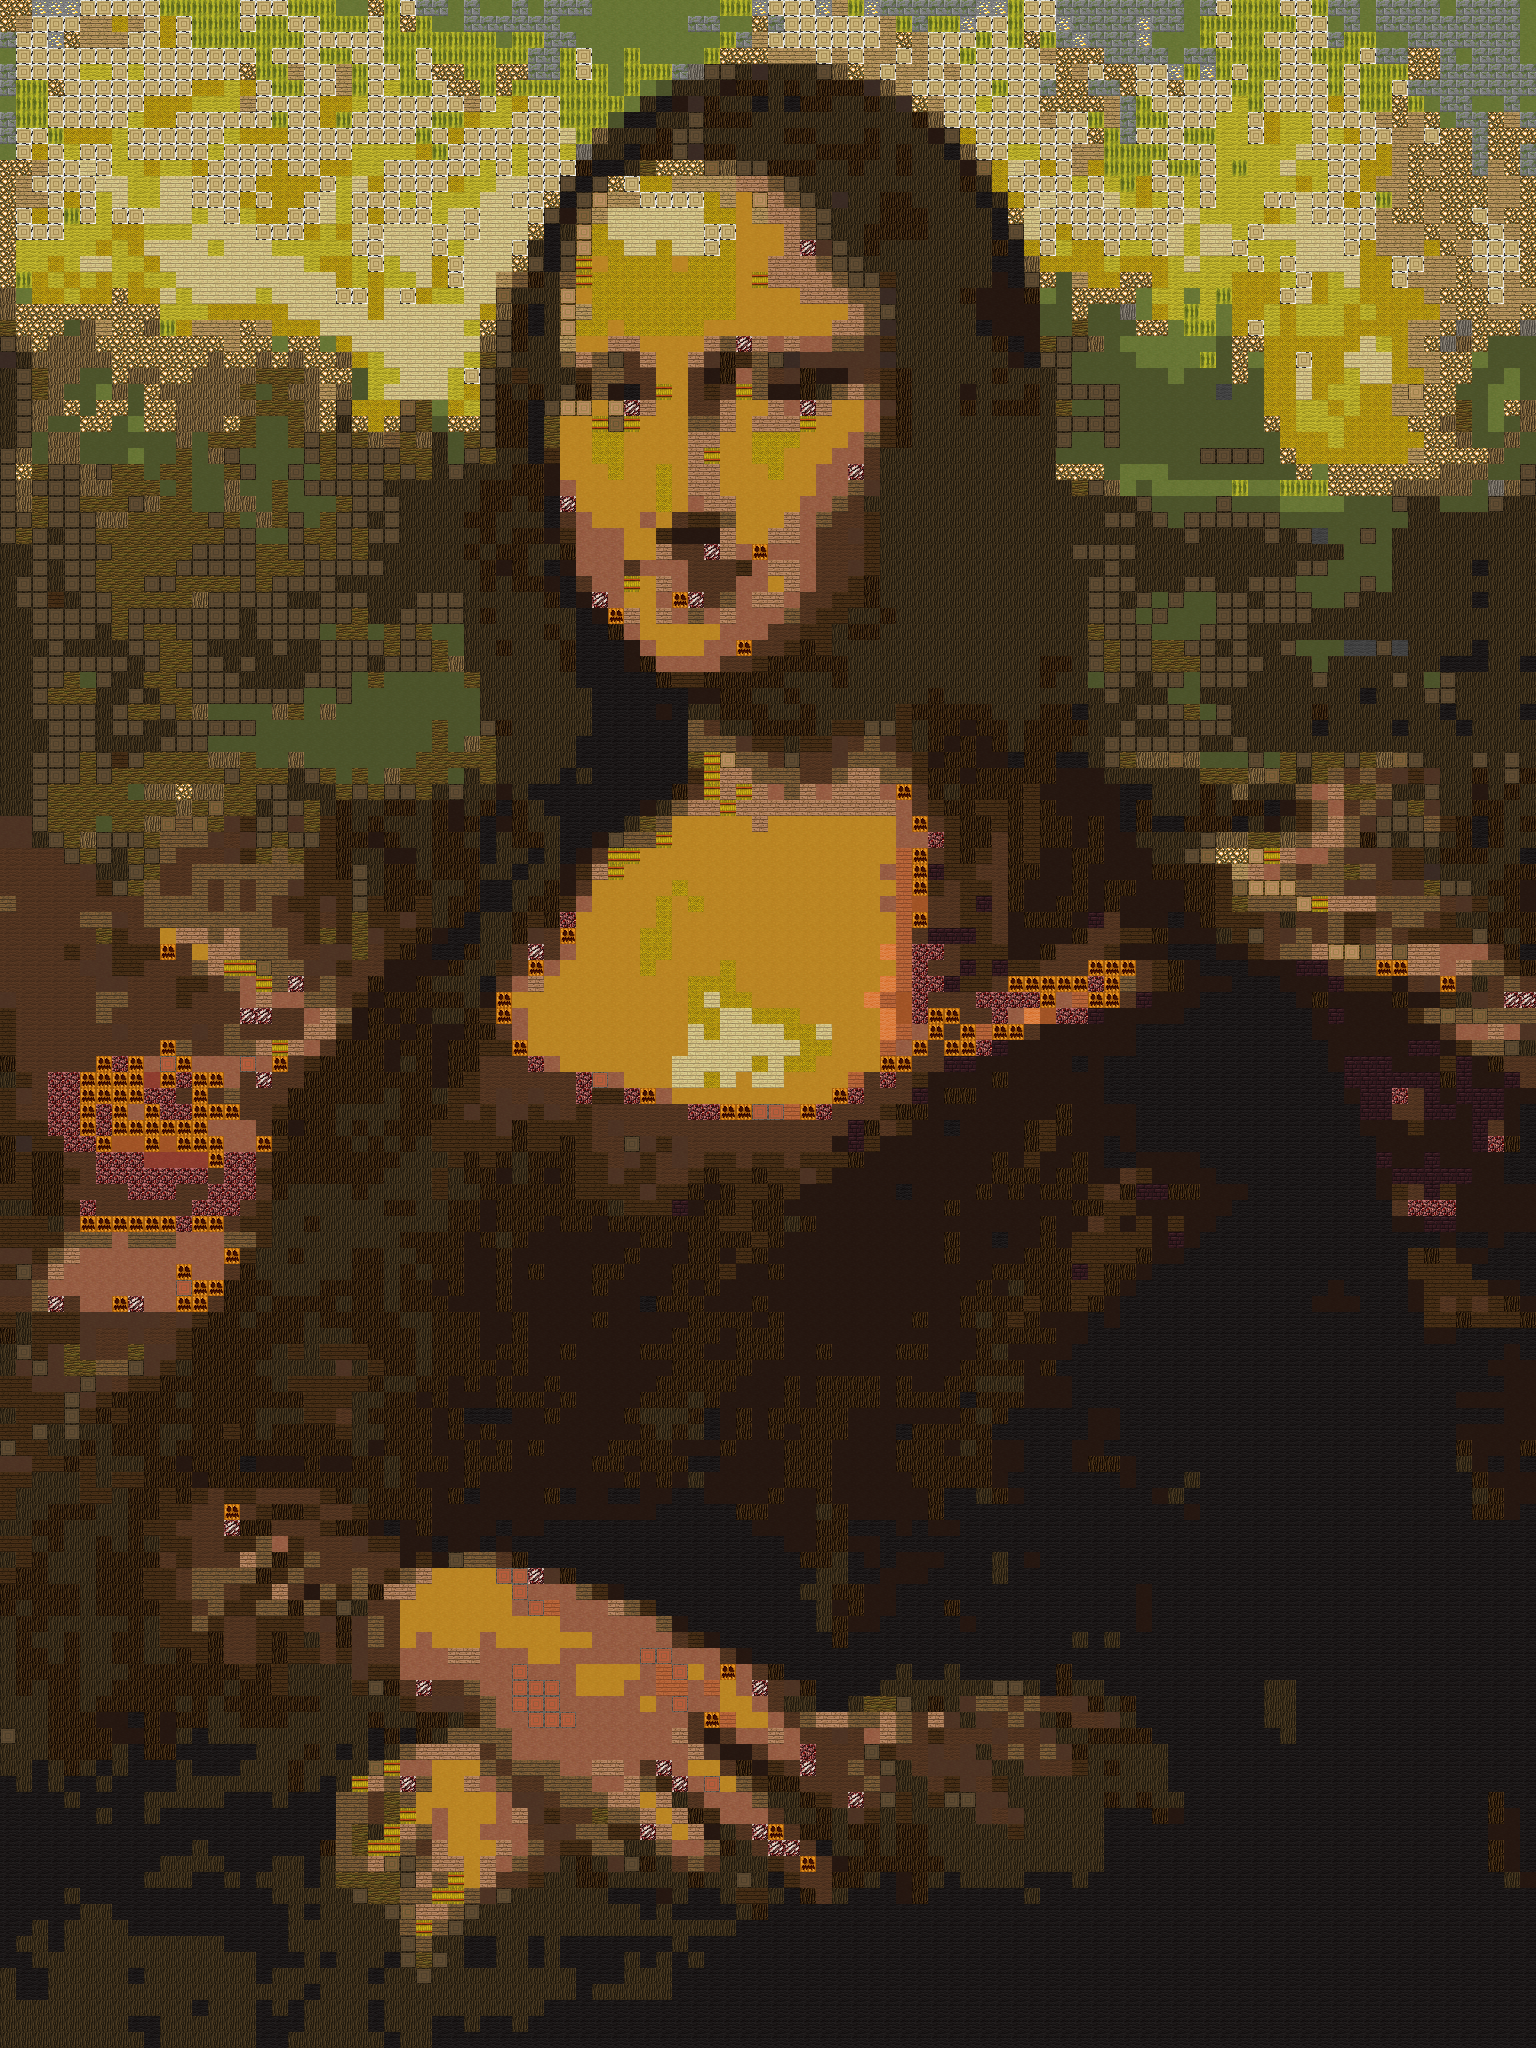 minecraft_dot (4).png